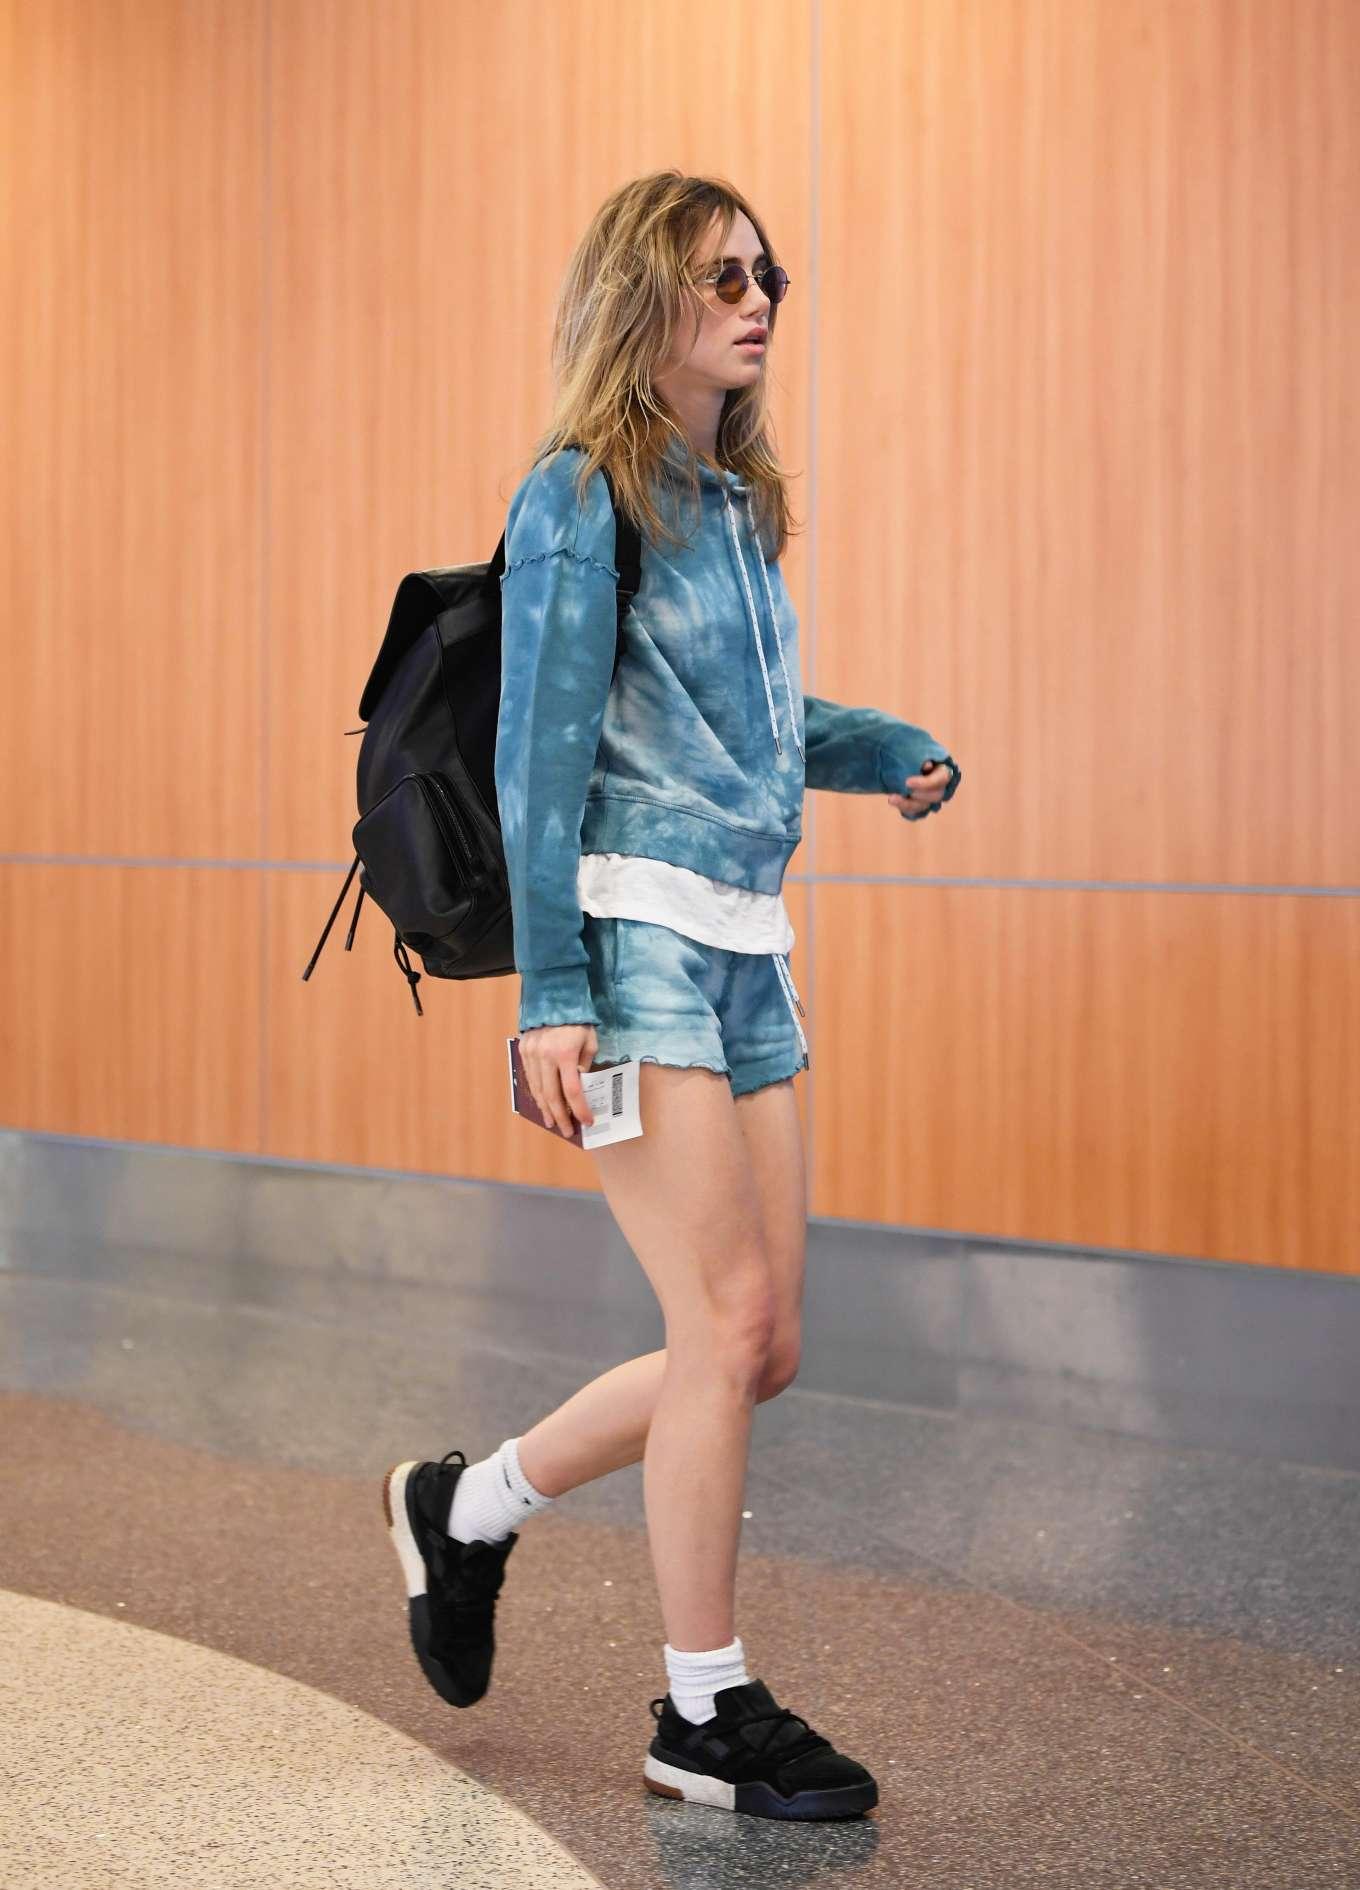 Suki Waterhouse 2019 : Suki Waterhouse in Denim Shorts: Arrives at LAX Airport-03